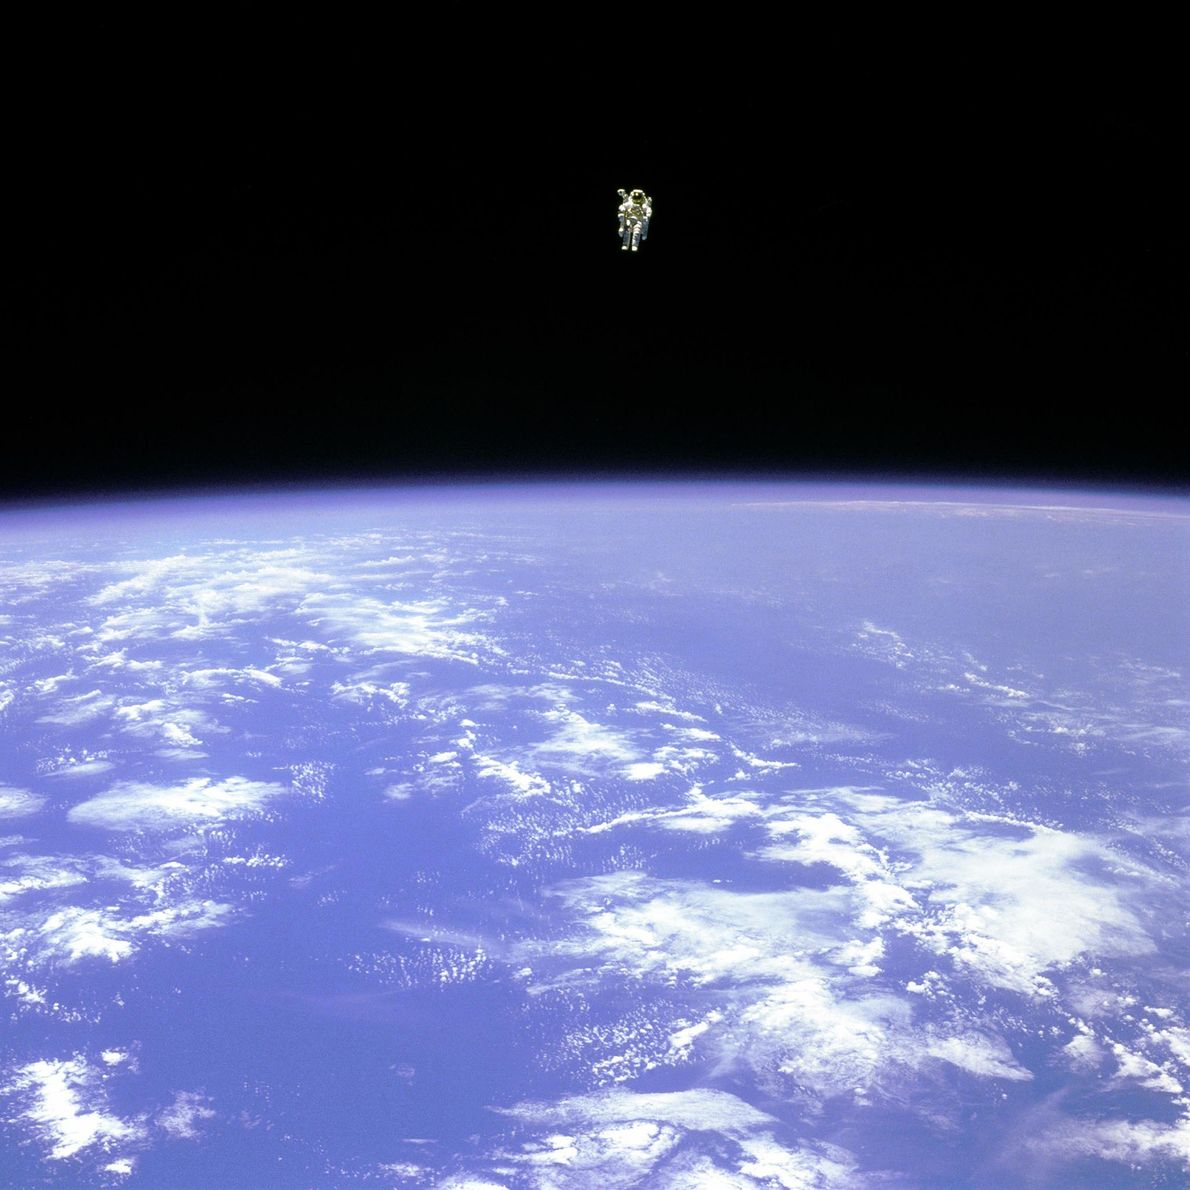 O astronauta Bruce McCandless paira sobre o planeta Terra